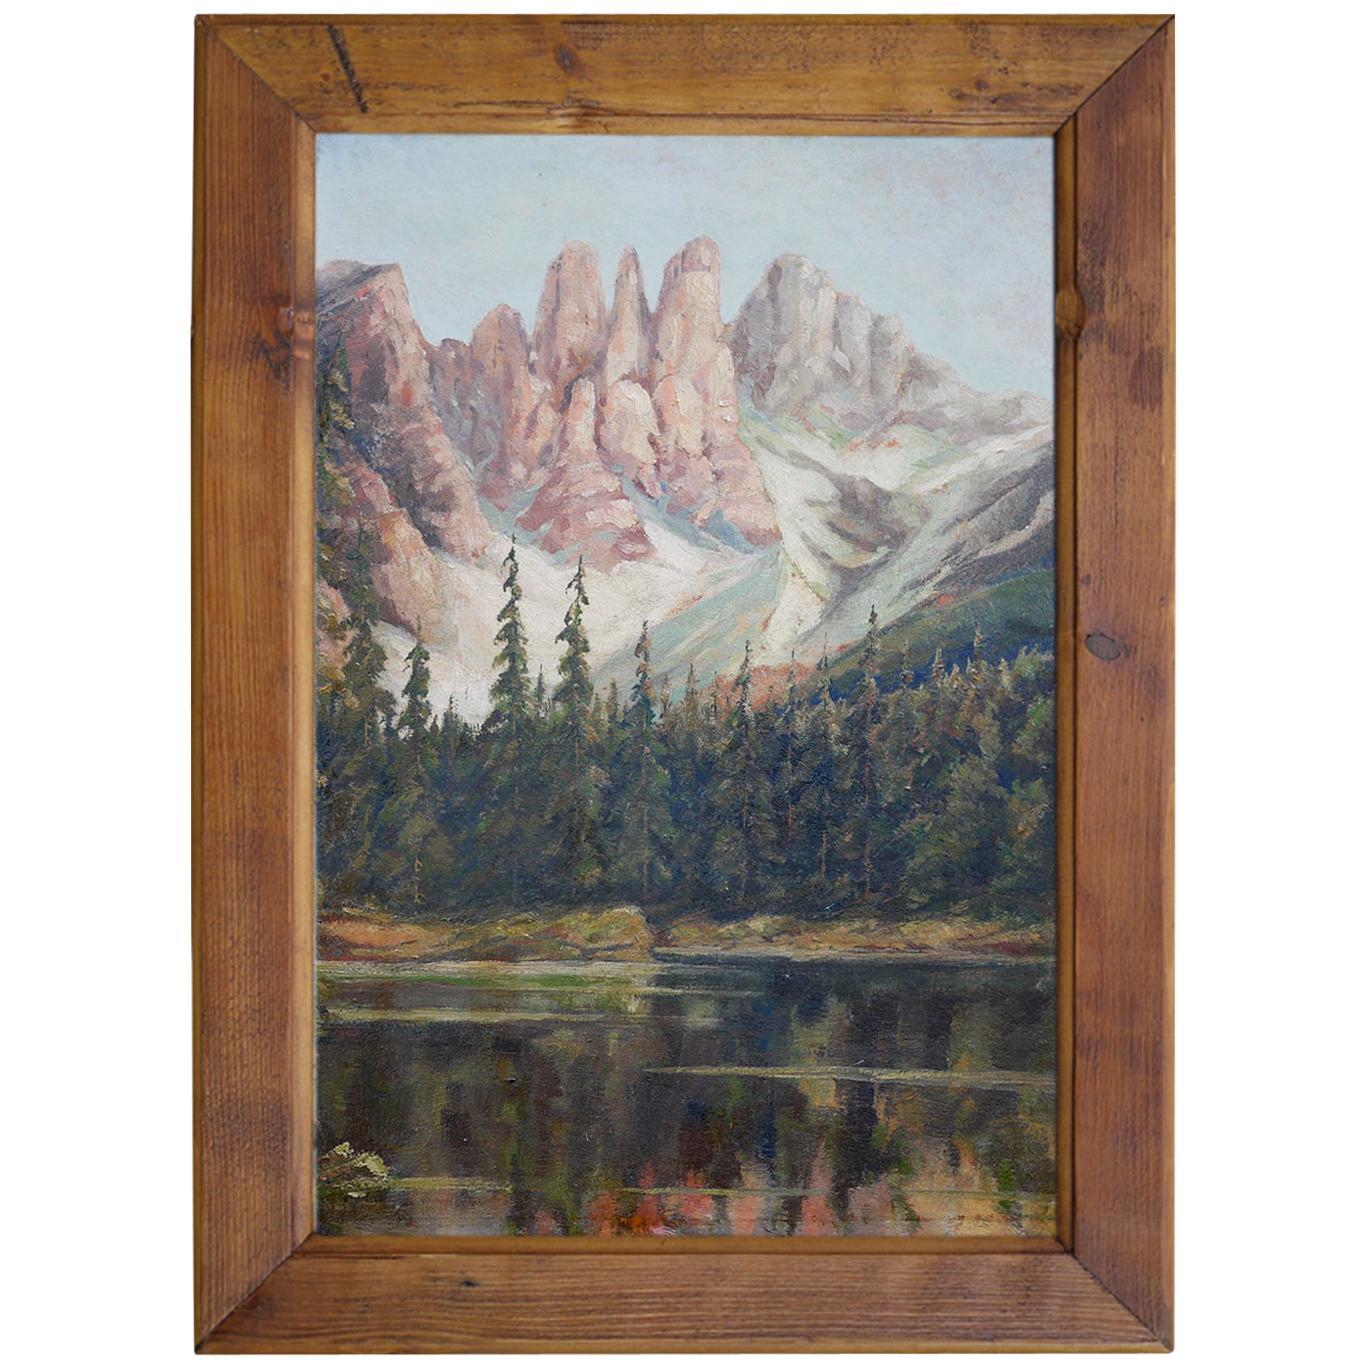 Mountain Painting, Dolomites, Oil on Cardboard, 1920